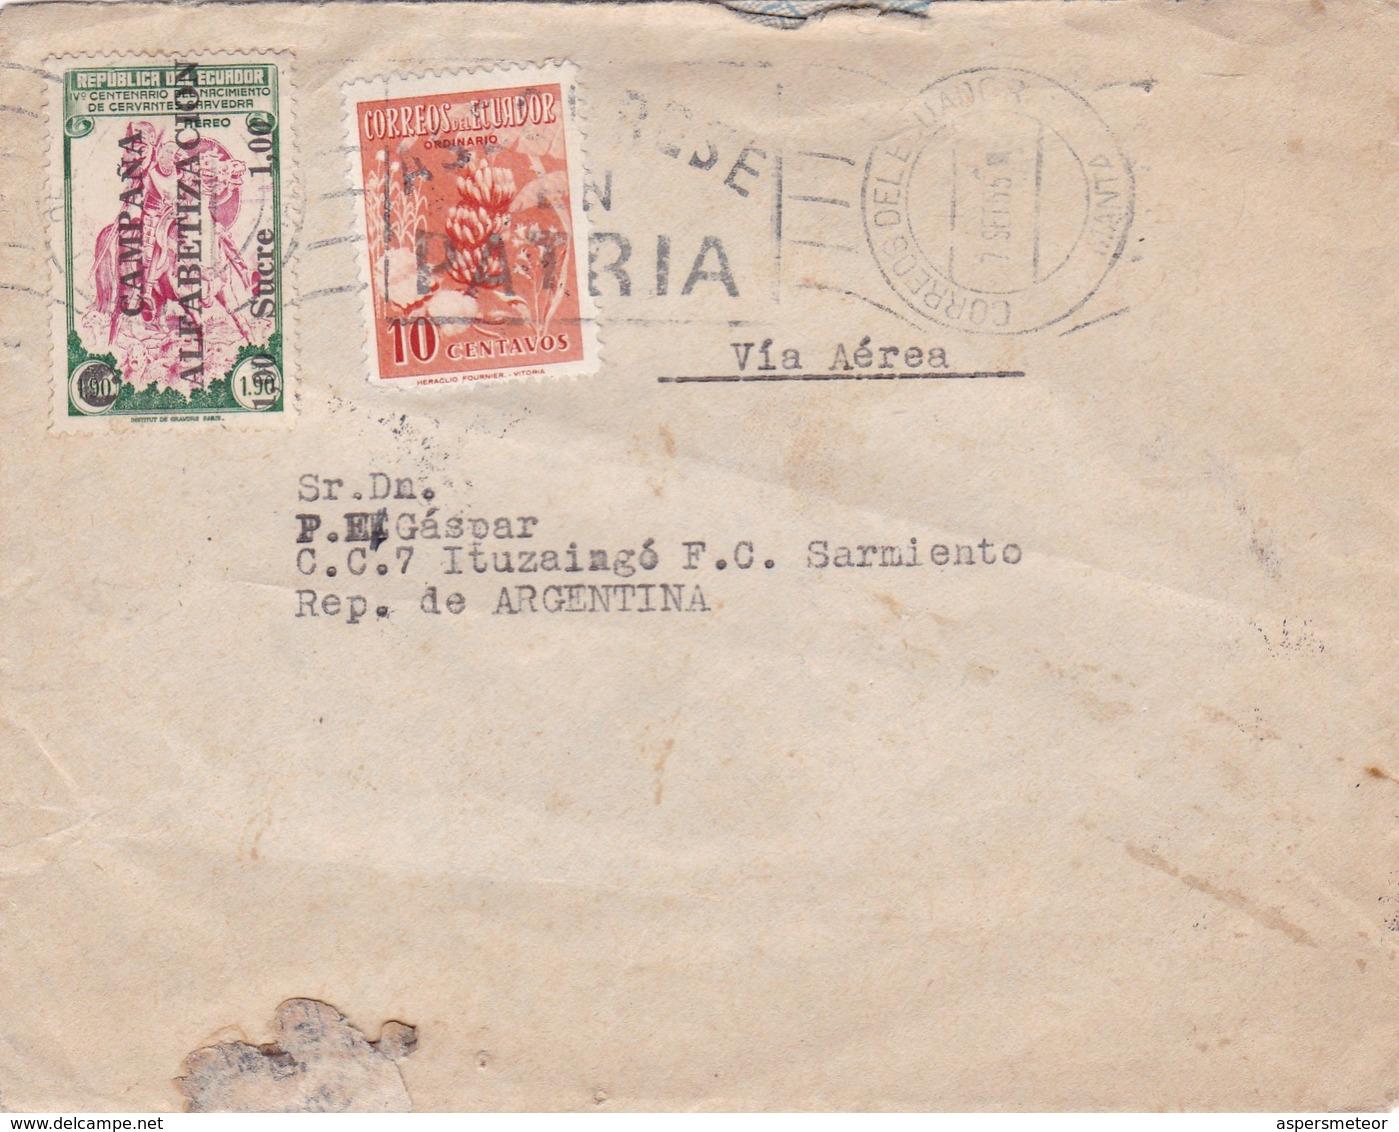 1955 COVER CIRCULEE ECUADOR VIA AEREA TO ARGENTINE. BANDELETA PARLANTE, SURCHARGE BLACK - BLEUP - Equateur